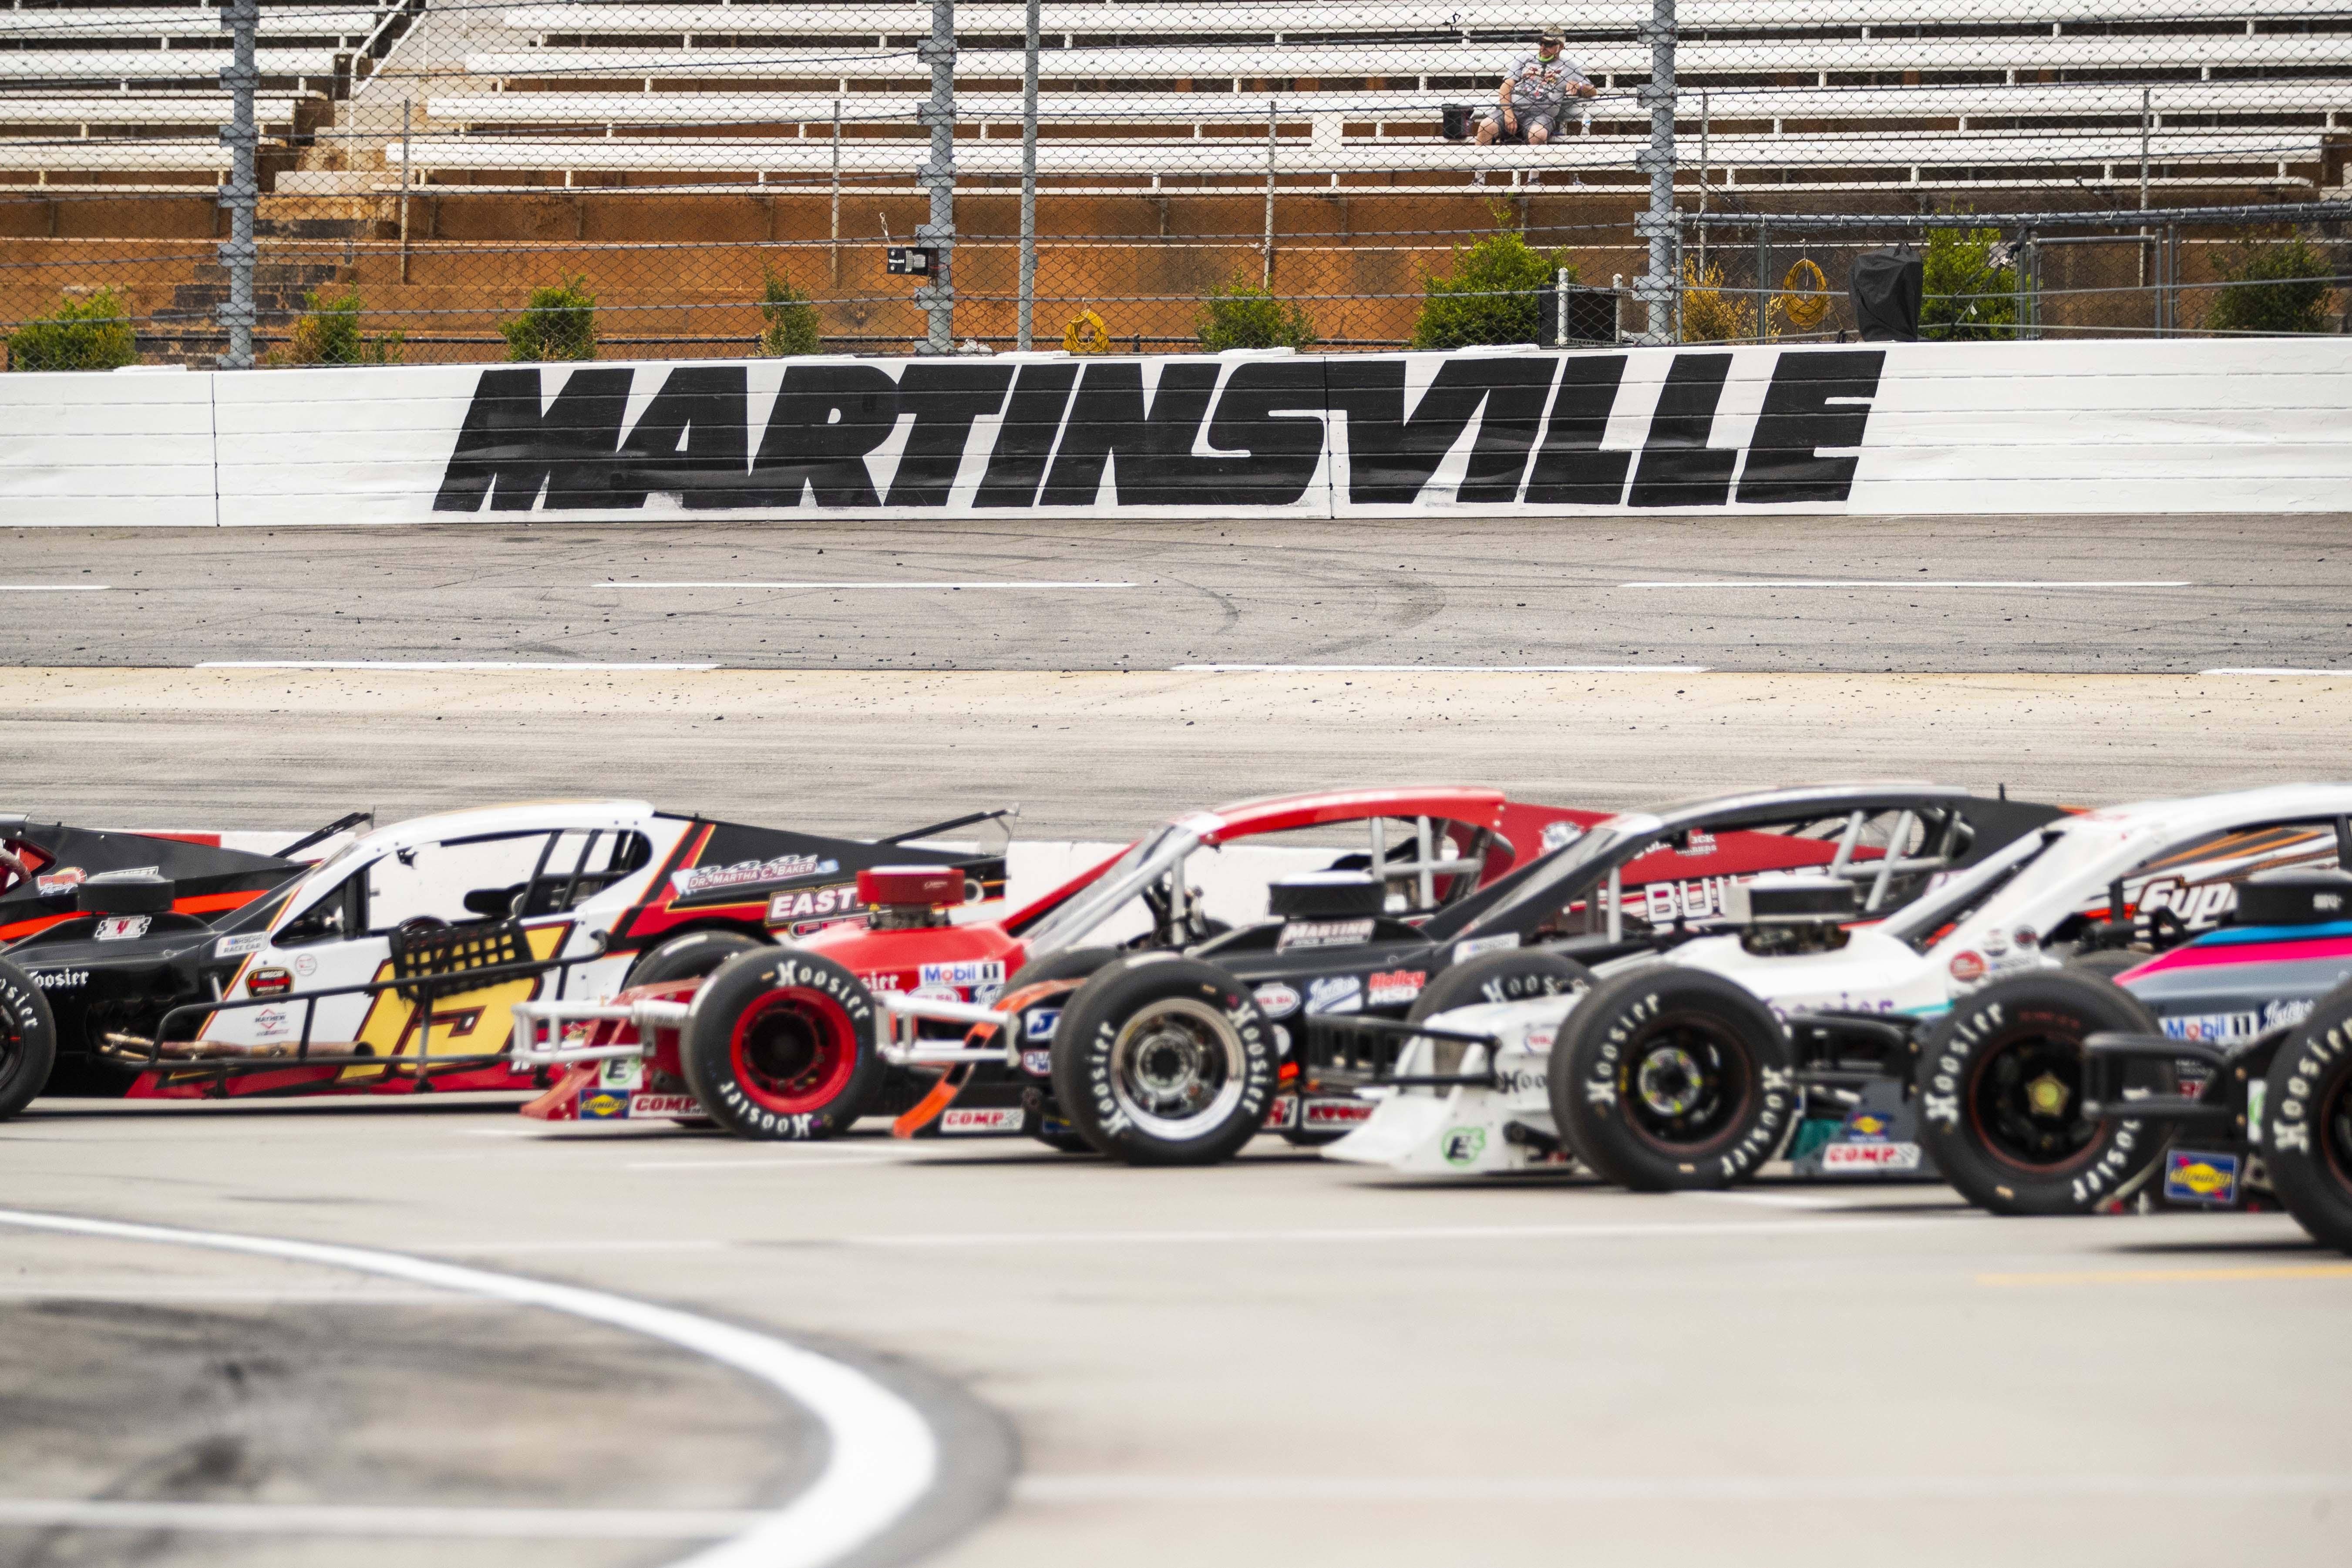 NASCAR Whelen Modified Series - Martinsville Speedway